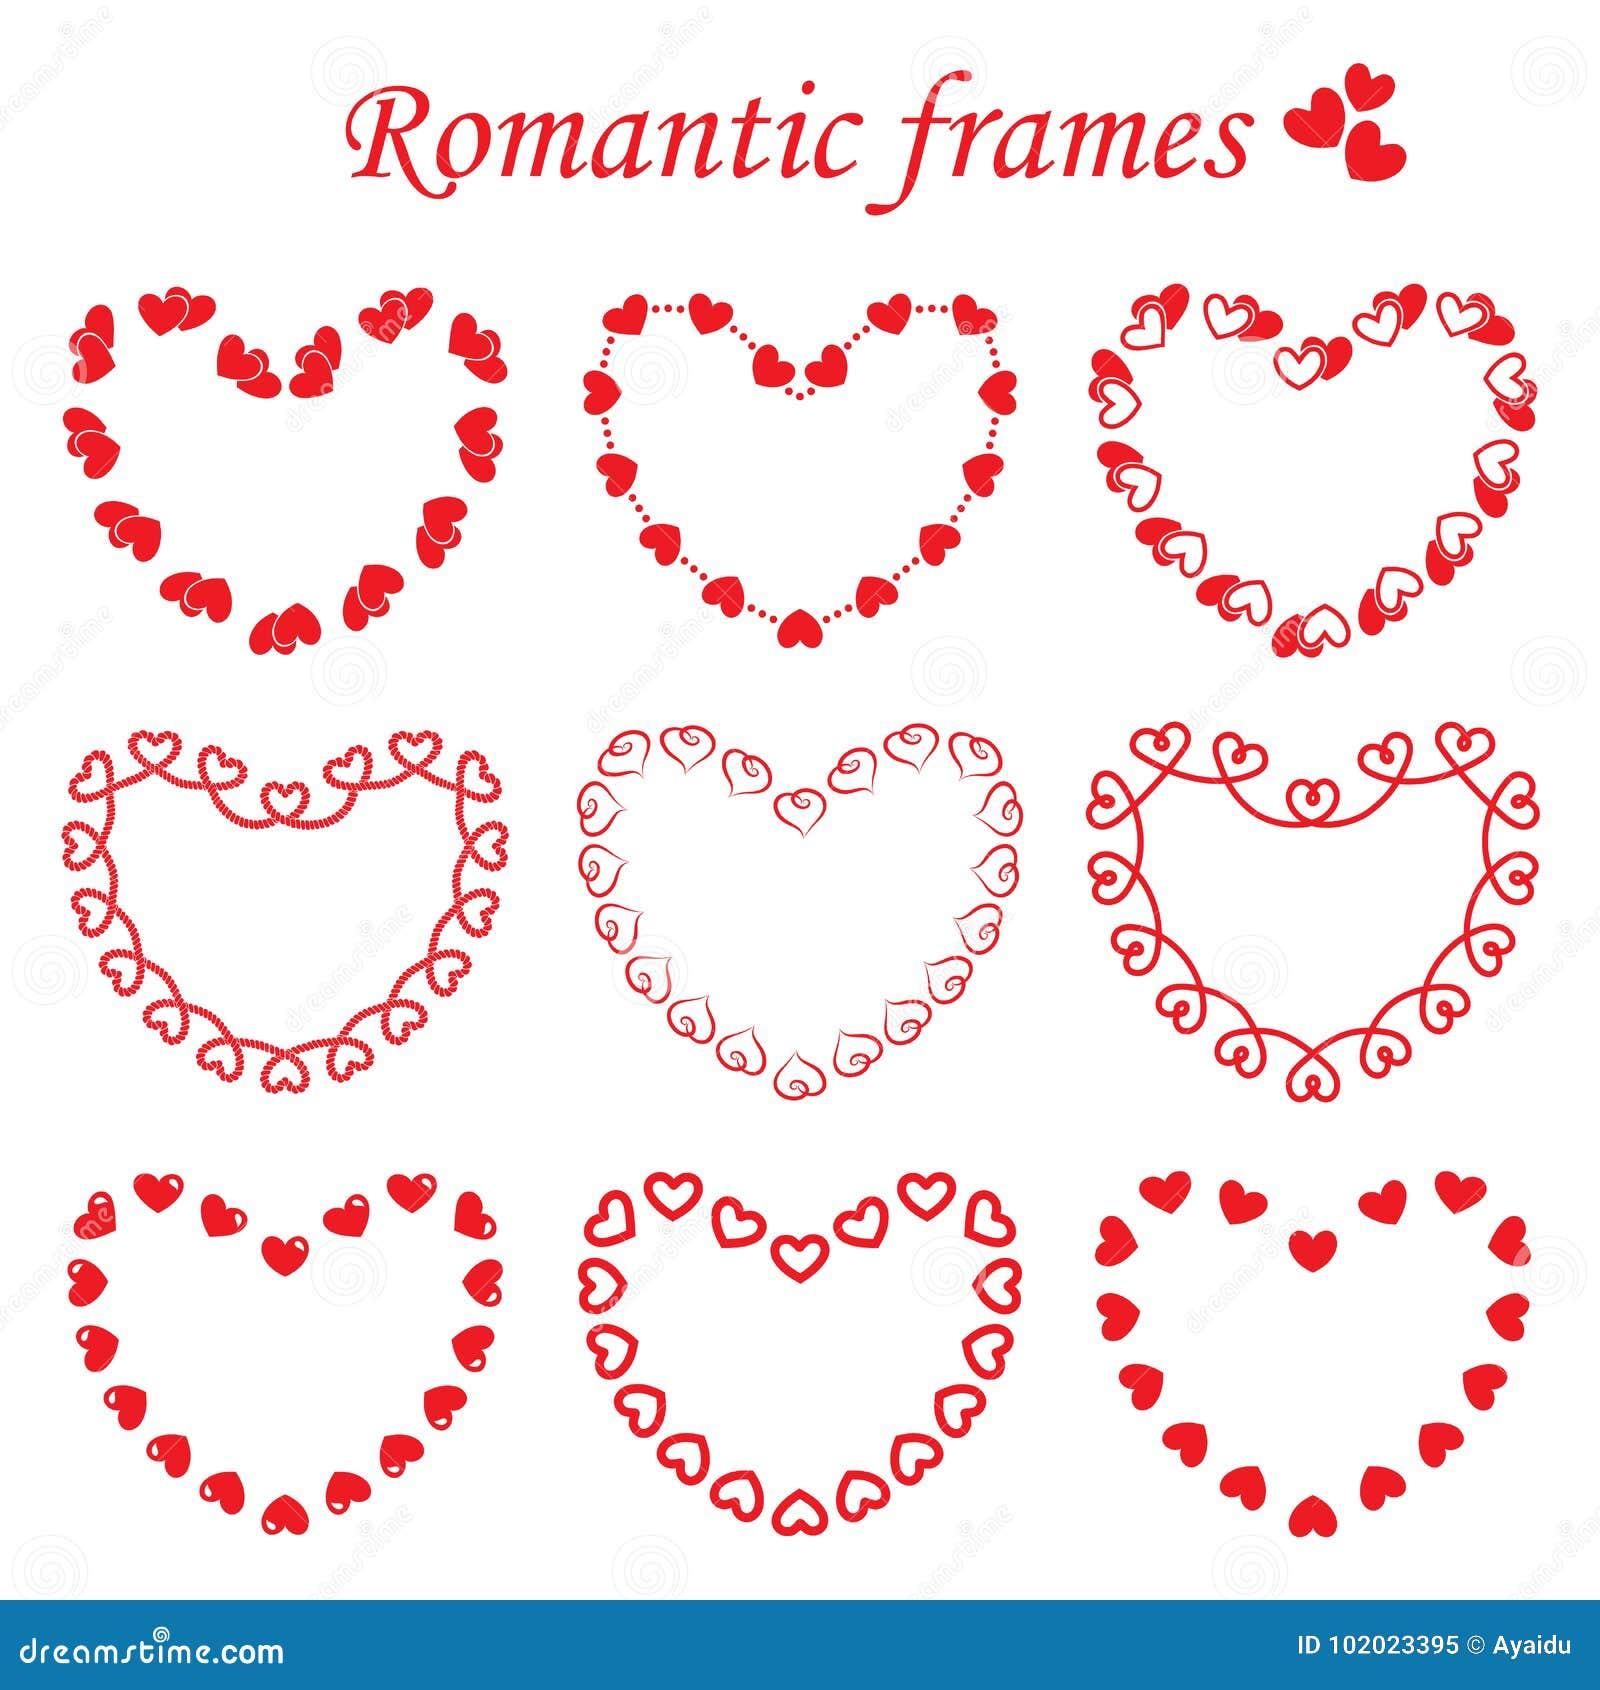 ad16f5cf43 Vector Set Of Romantic Frames Stock Vector - Illustration of ...